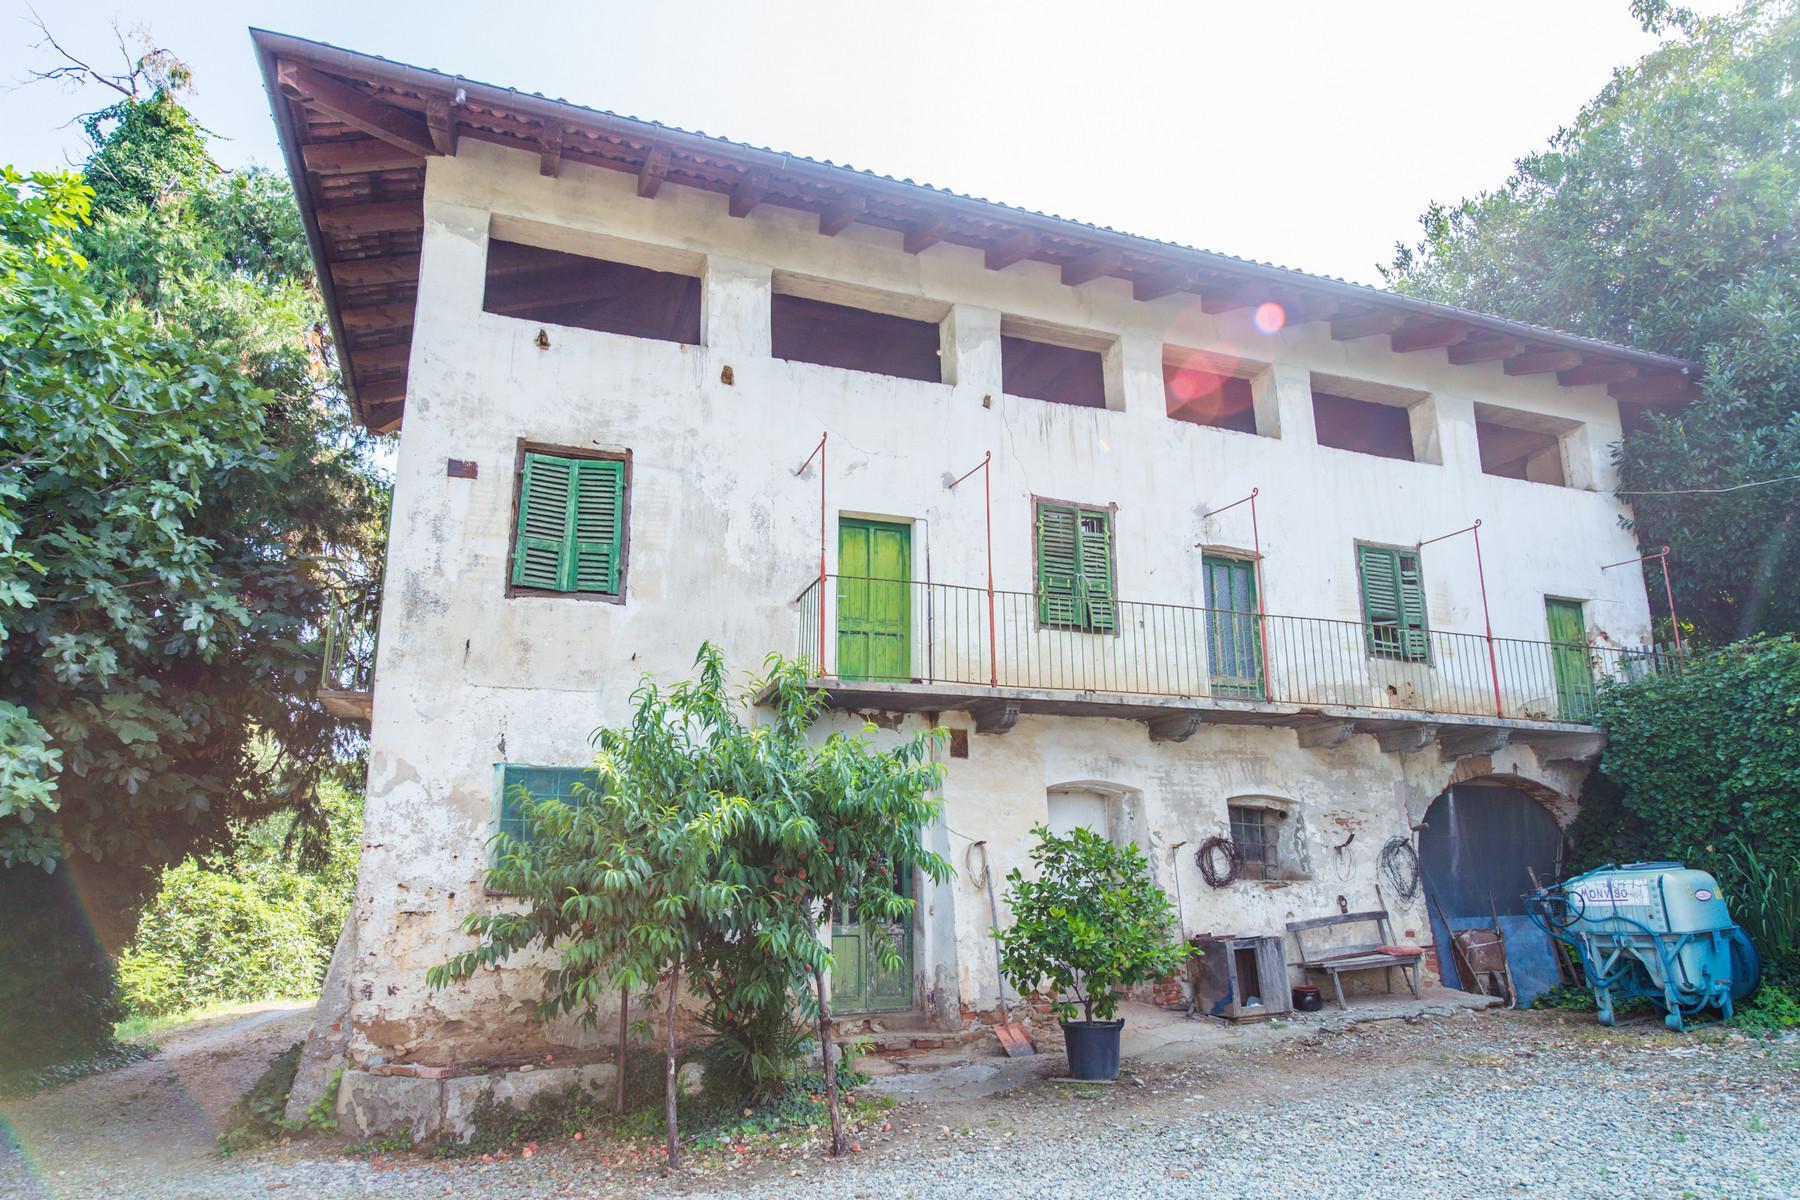 Splendid villa with winery in Piedmont - 25